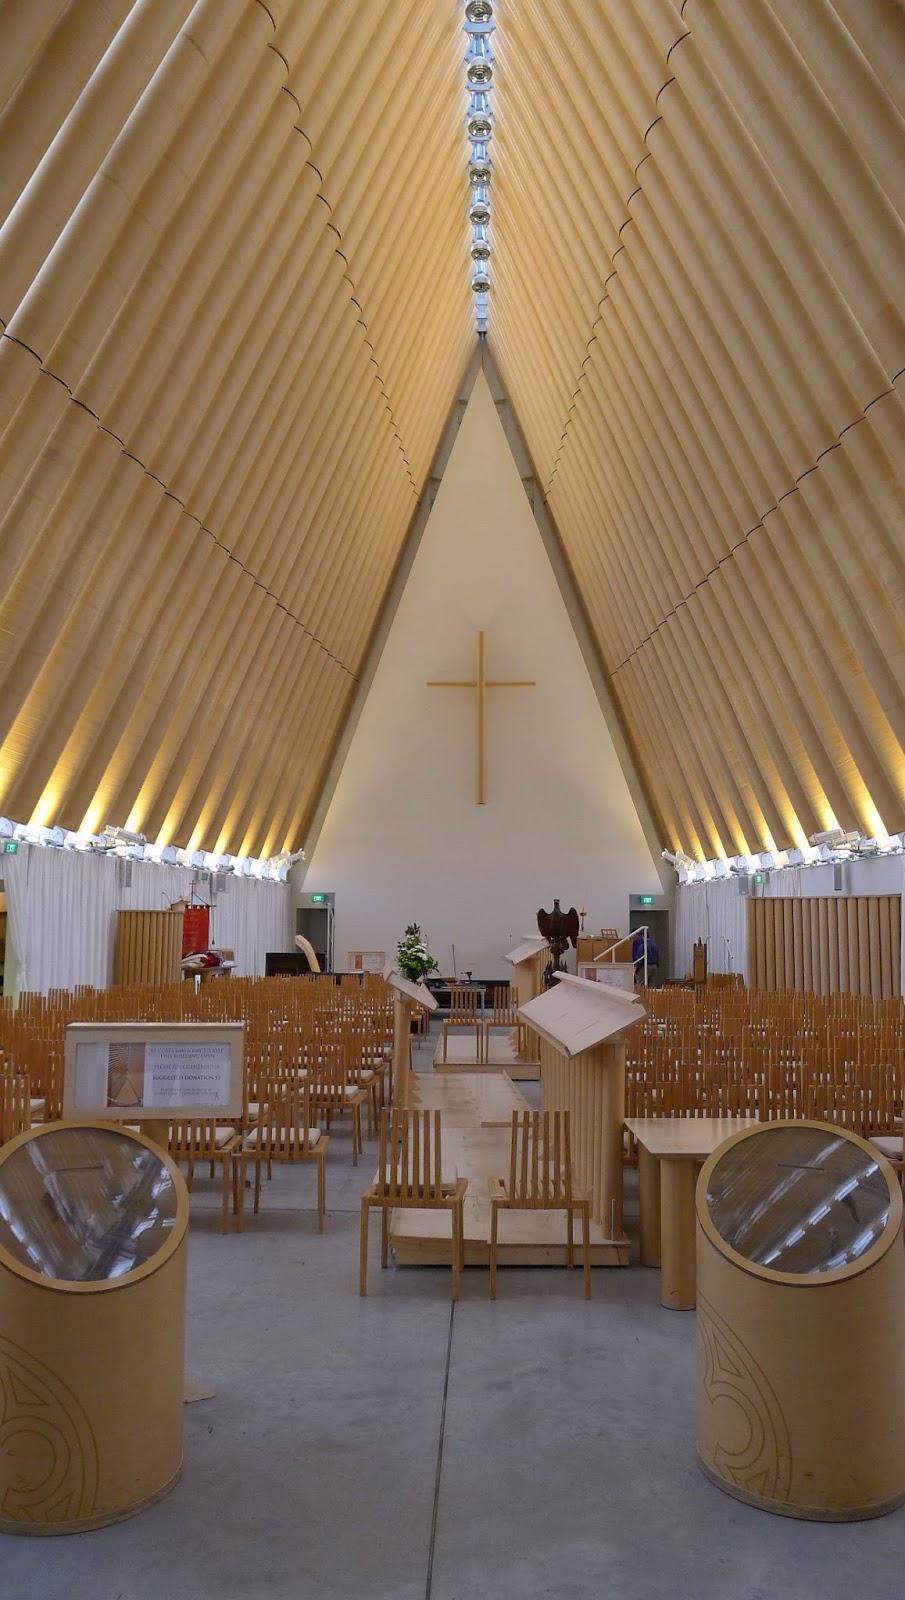 avb blog taller de arquitectura buenos aires shigeru ban catedral de cart n. Black Bedroom Furniture Sets. Home Design Ideas